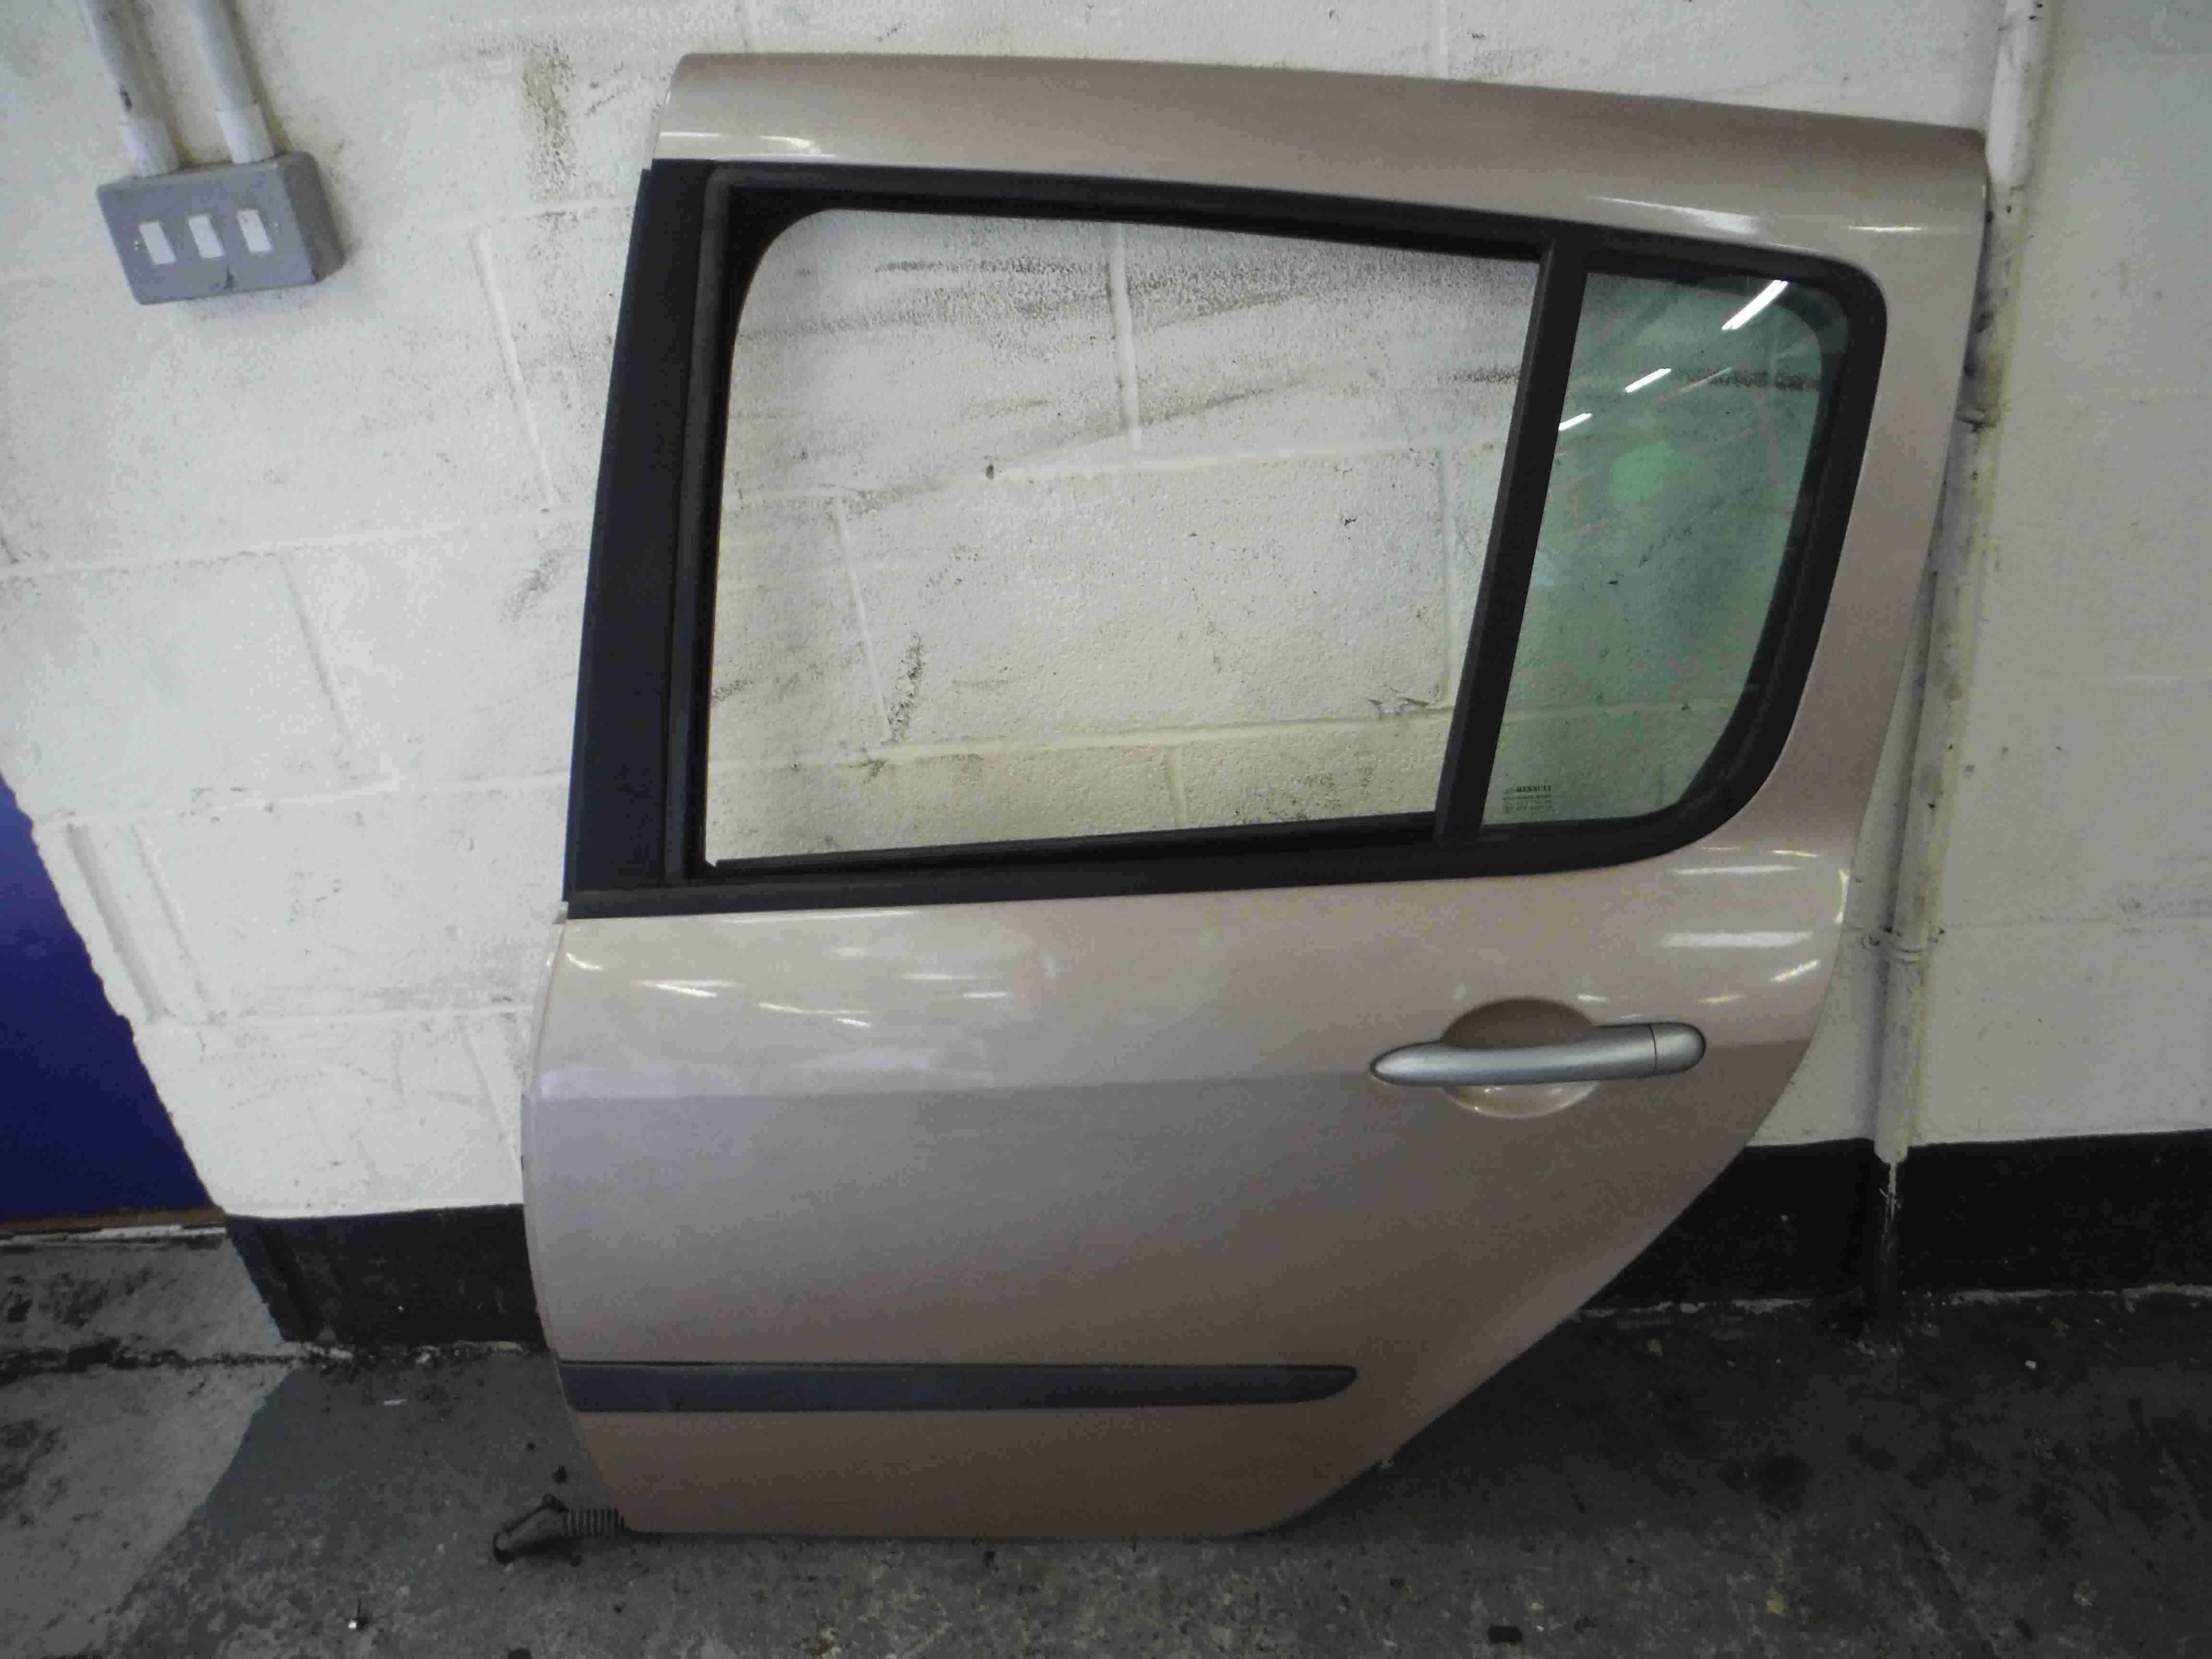 Renault Modus 2004-2008 Passenger NSR Rear Door Beige Brown Silver TED12